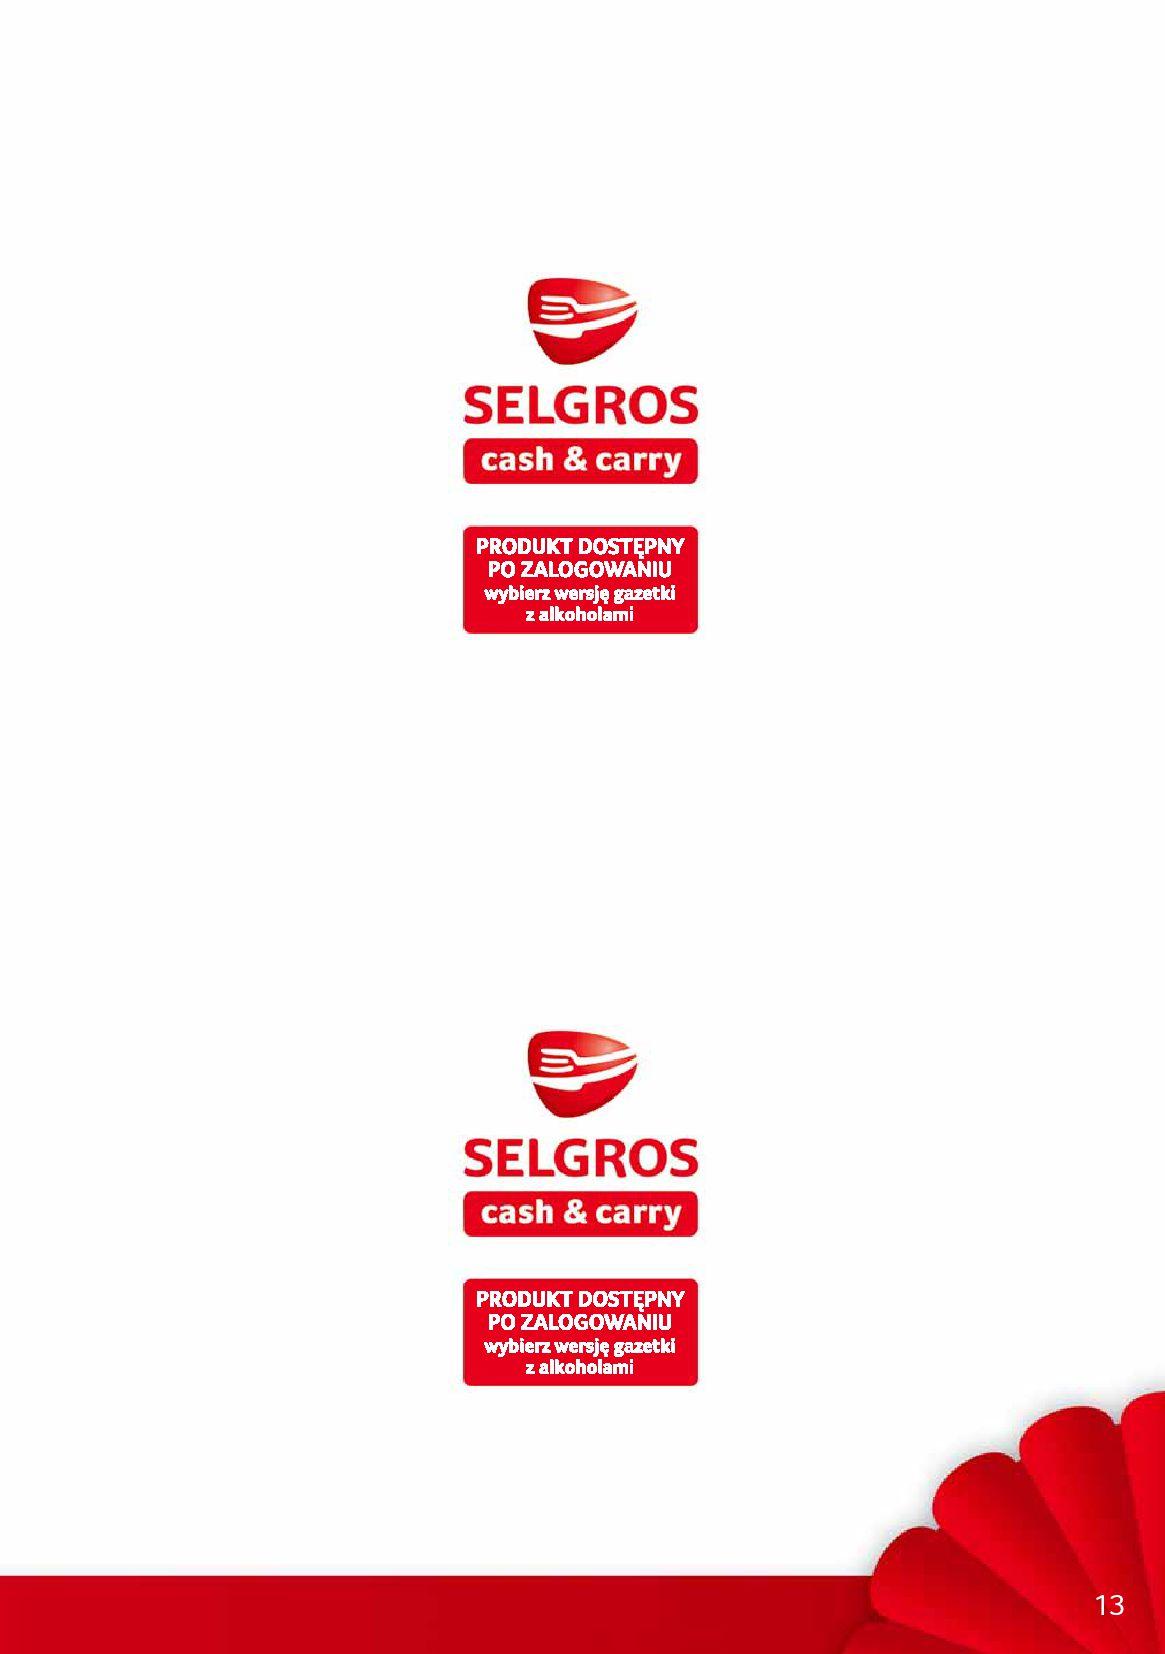 Gazetka Selgros - Debiuty w Selgros-09.10.2019-23.10.2019-page-13